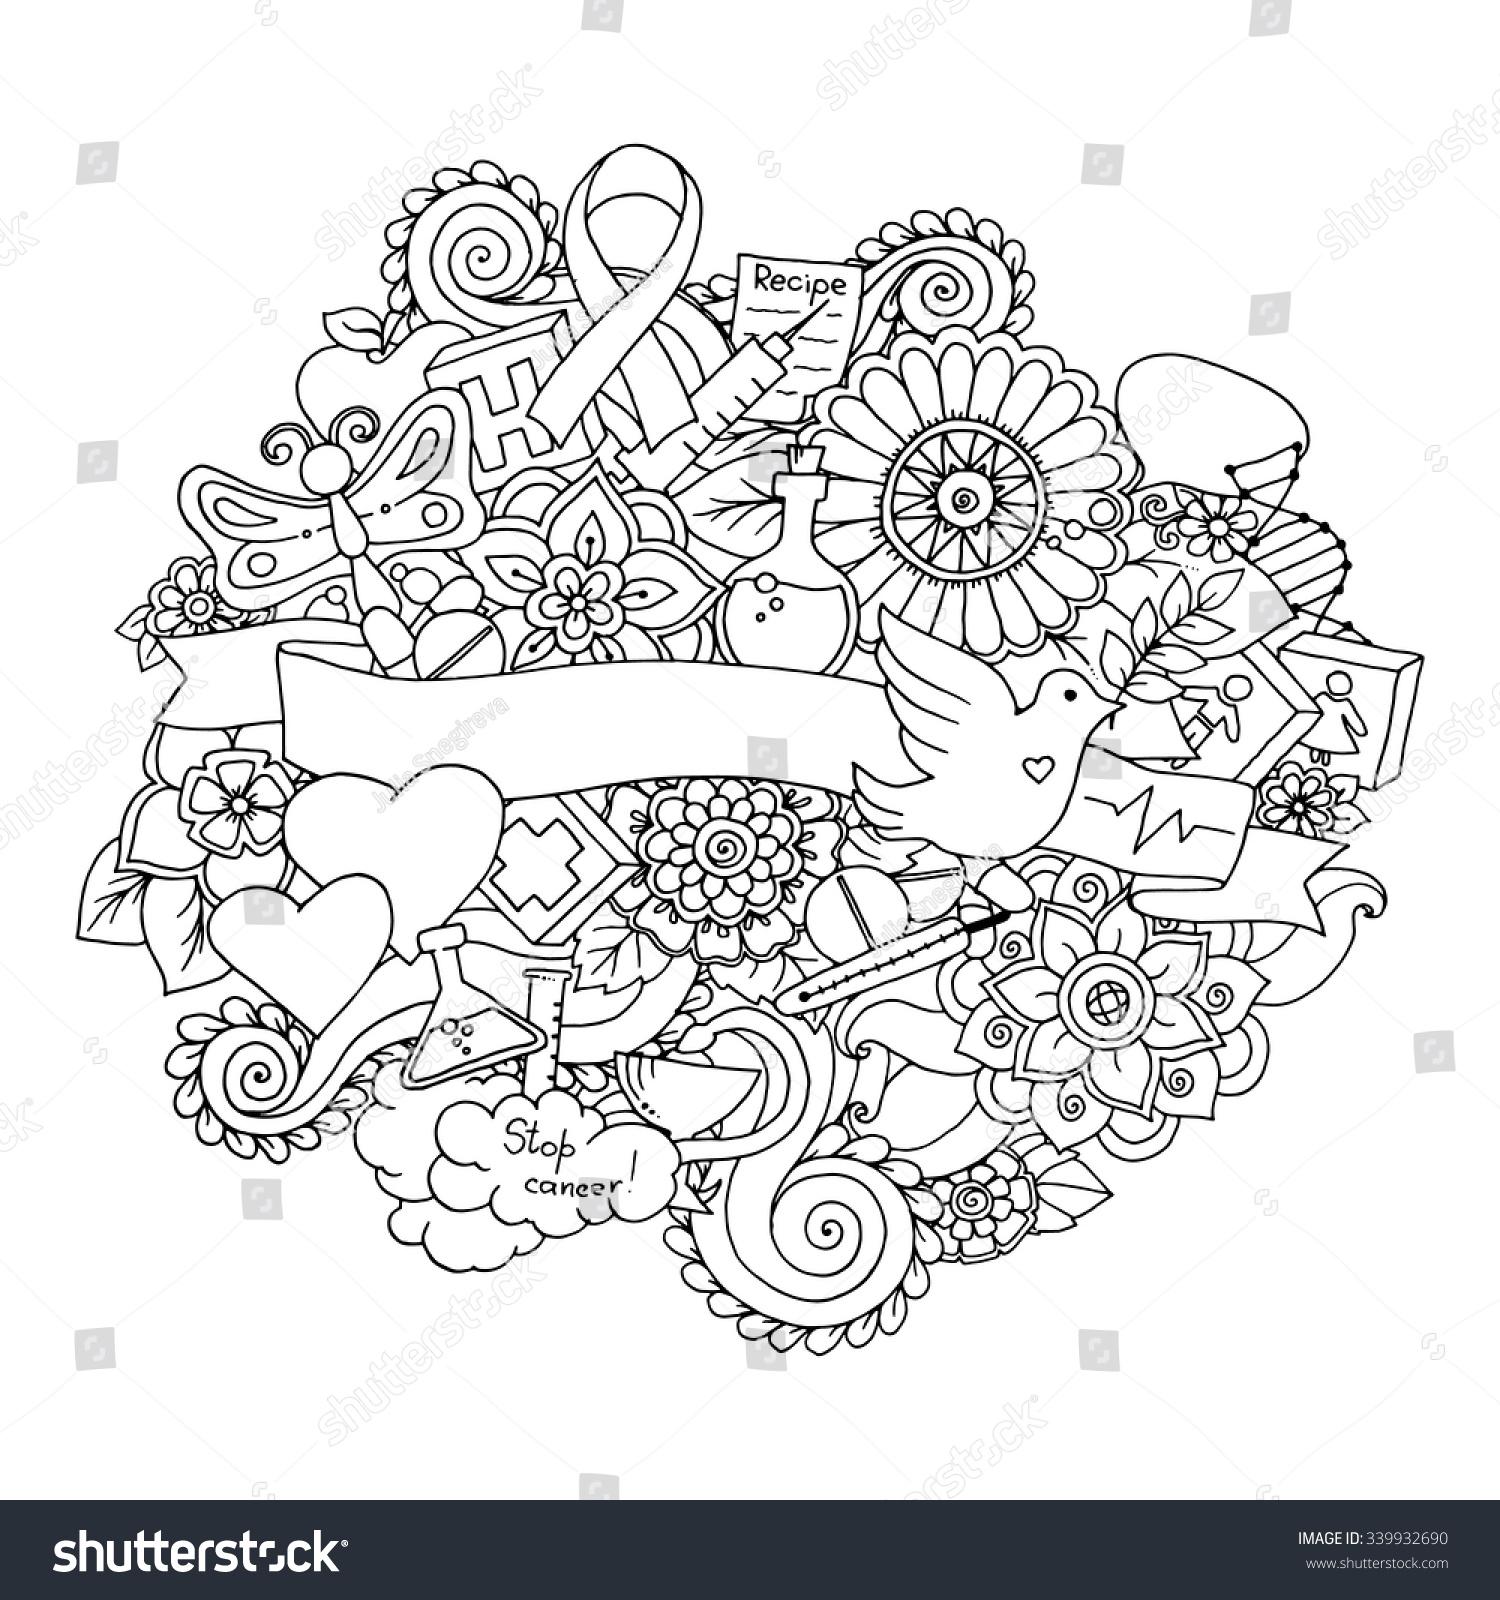 Vector Template Doodles Science Medicine Floral Stock Vector ...